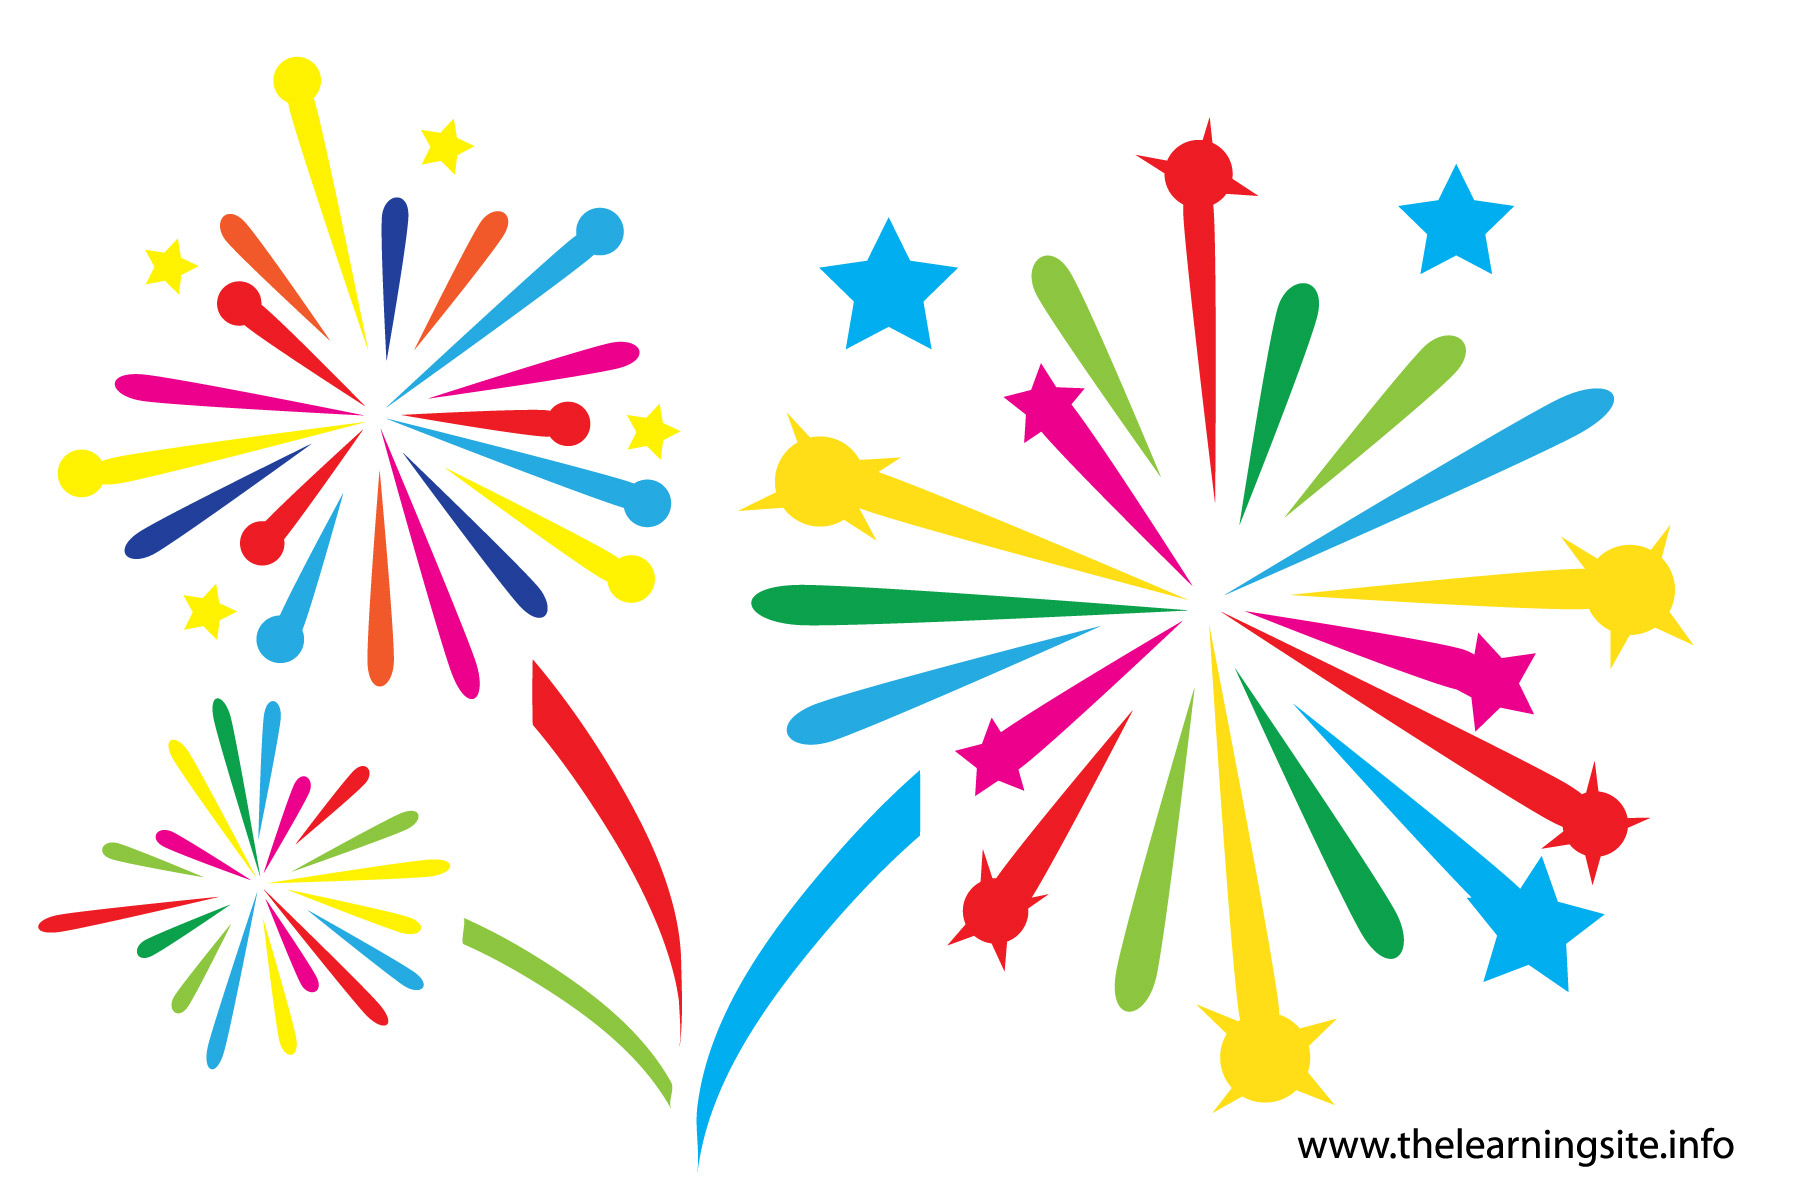 Celebration clipart firecracker Rvq04n cps Clipart Learning Fireworks